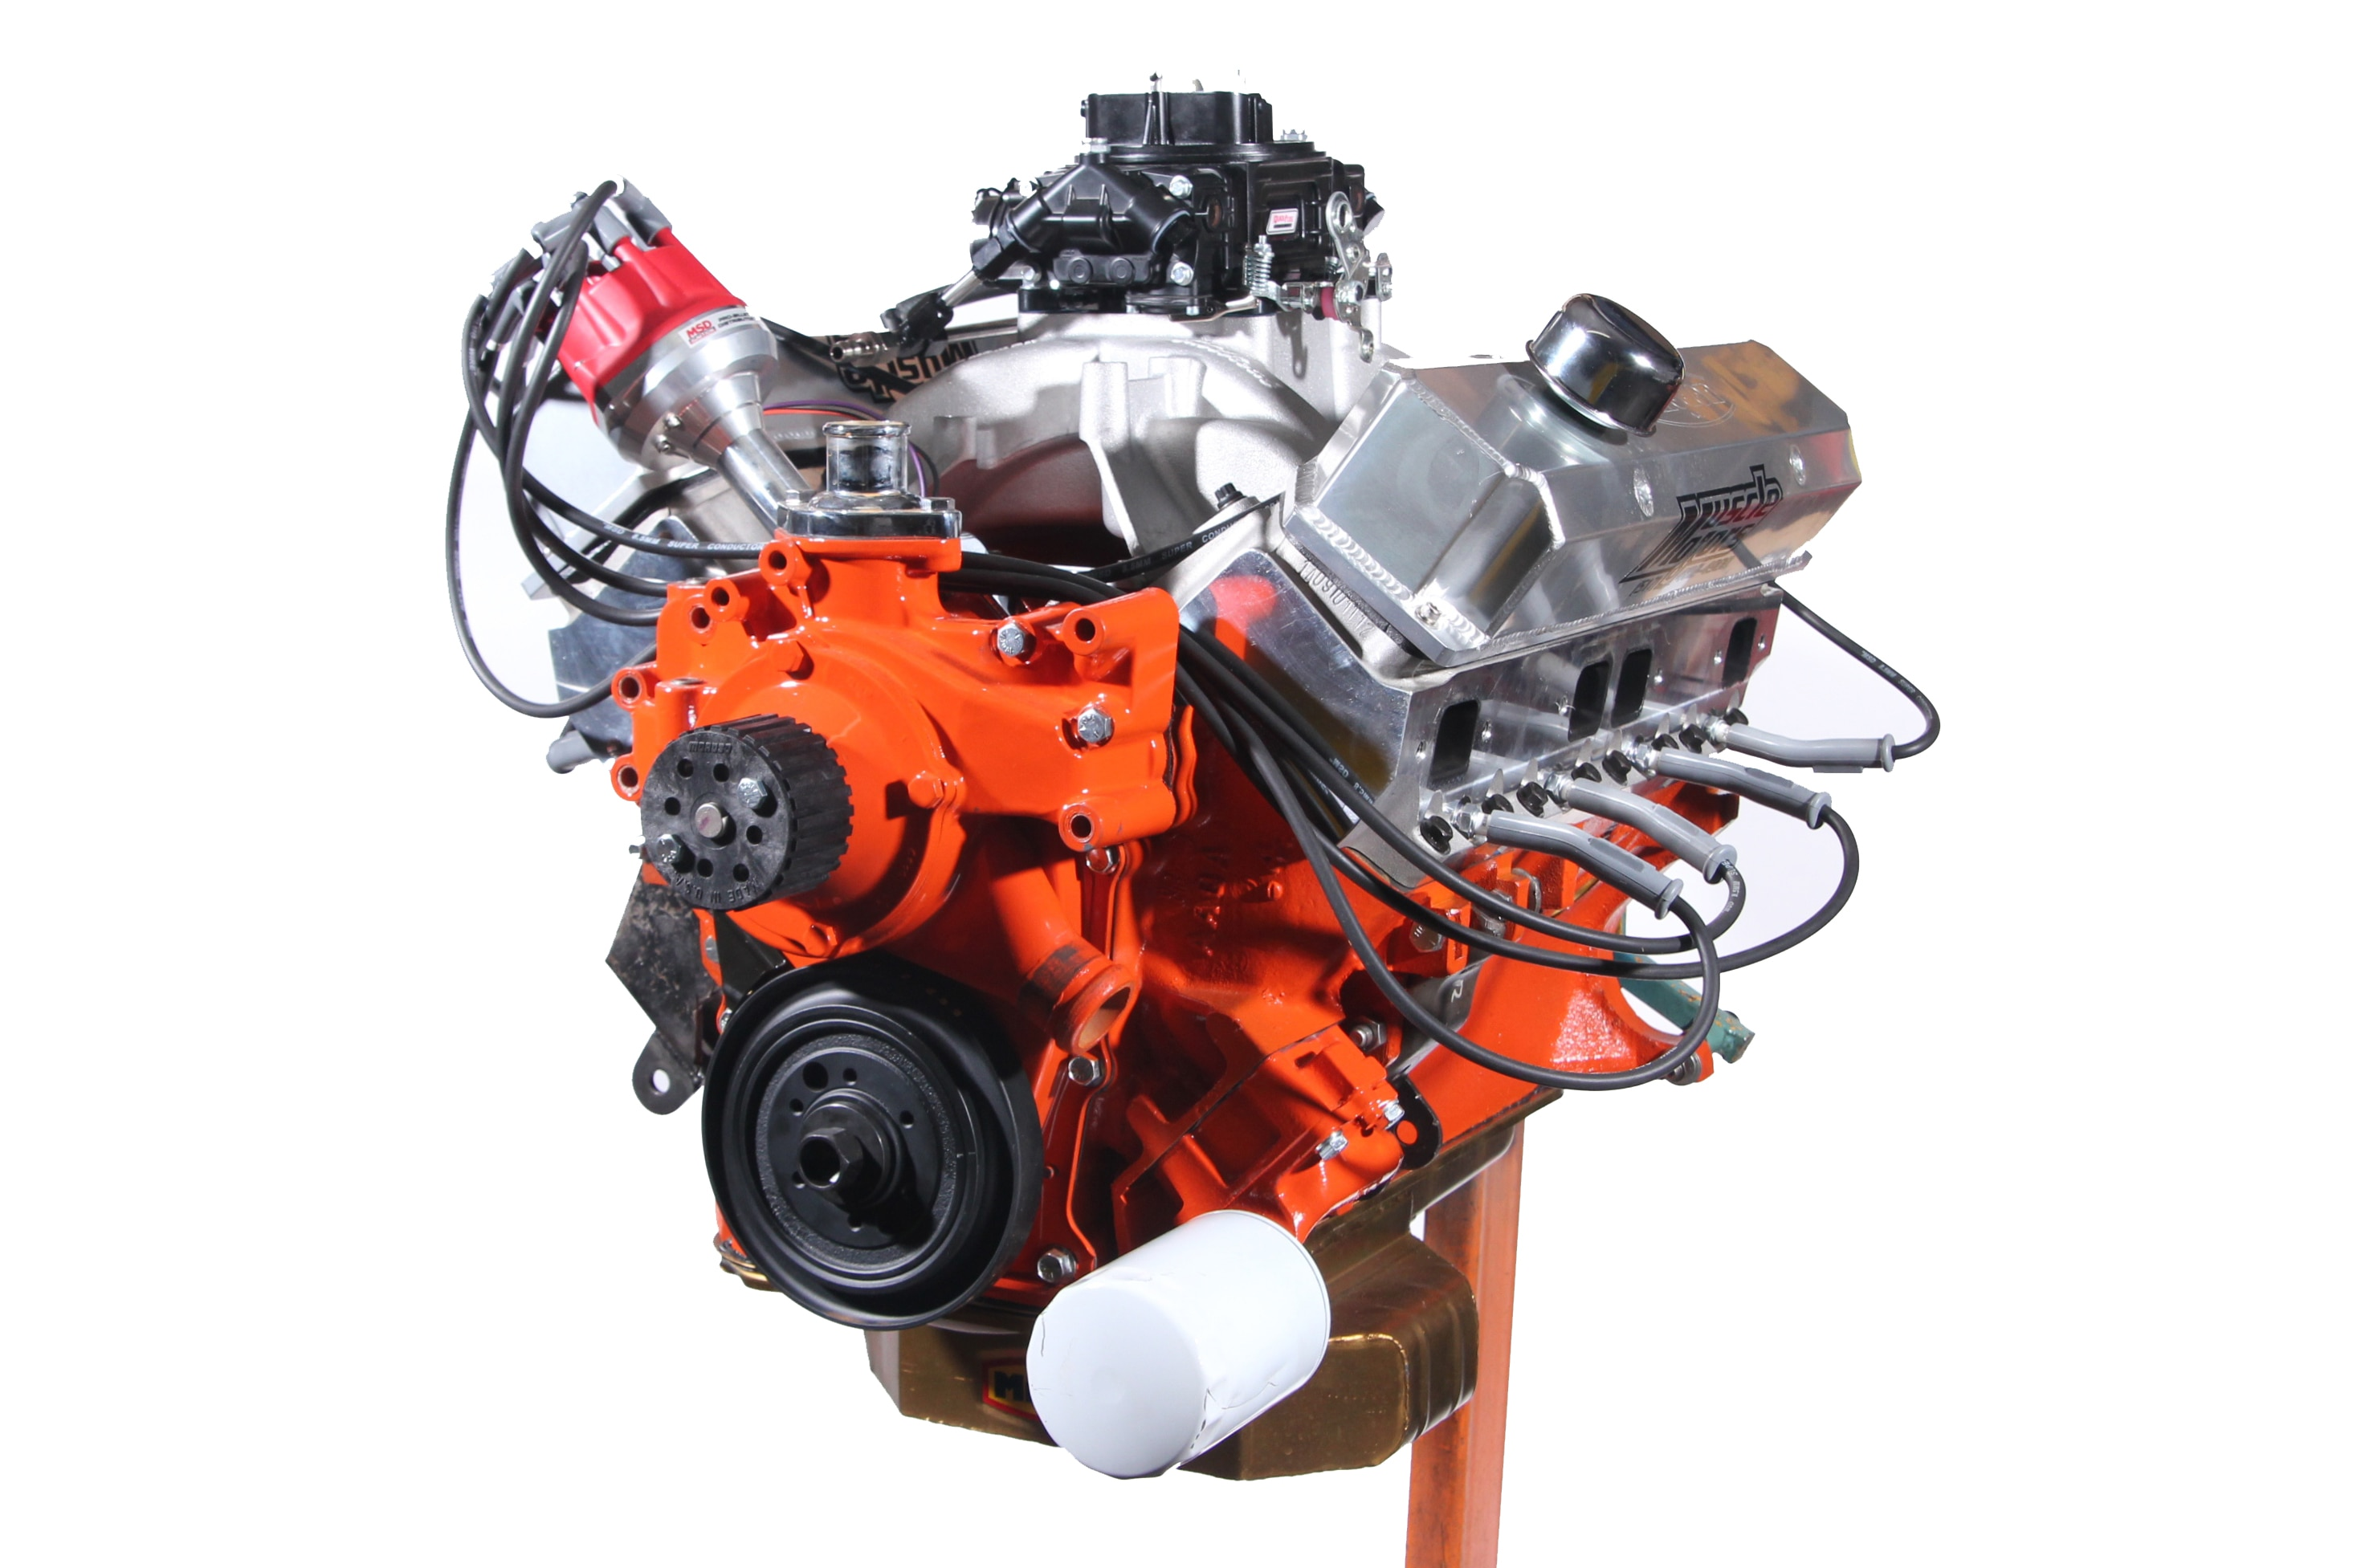 small resolution of chrysler 383 big block mopar for the masses hot rod network chrysler 383 engine diagrams